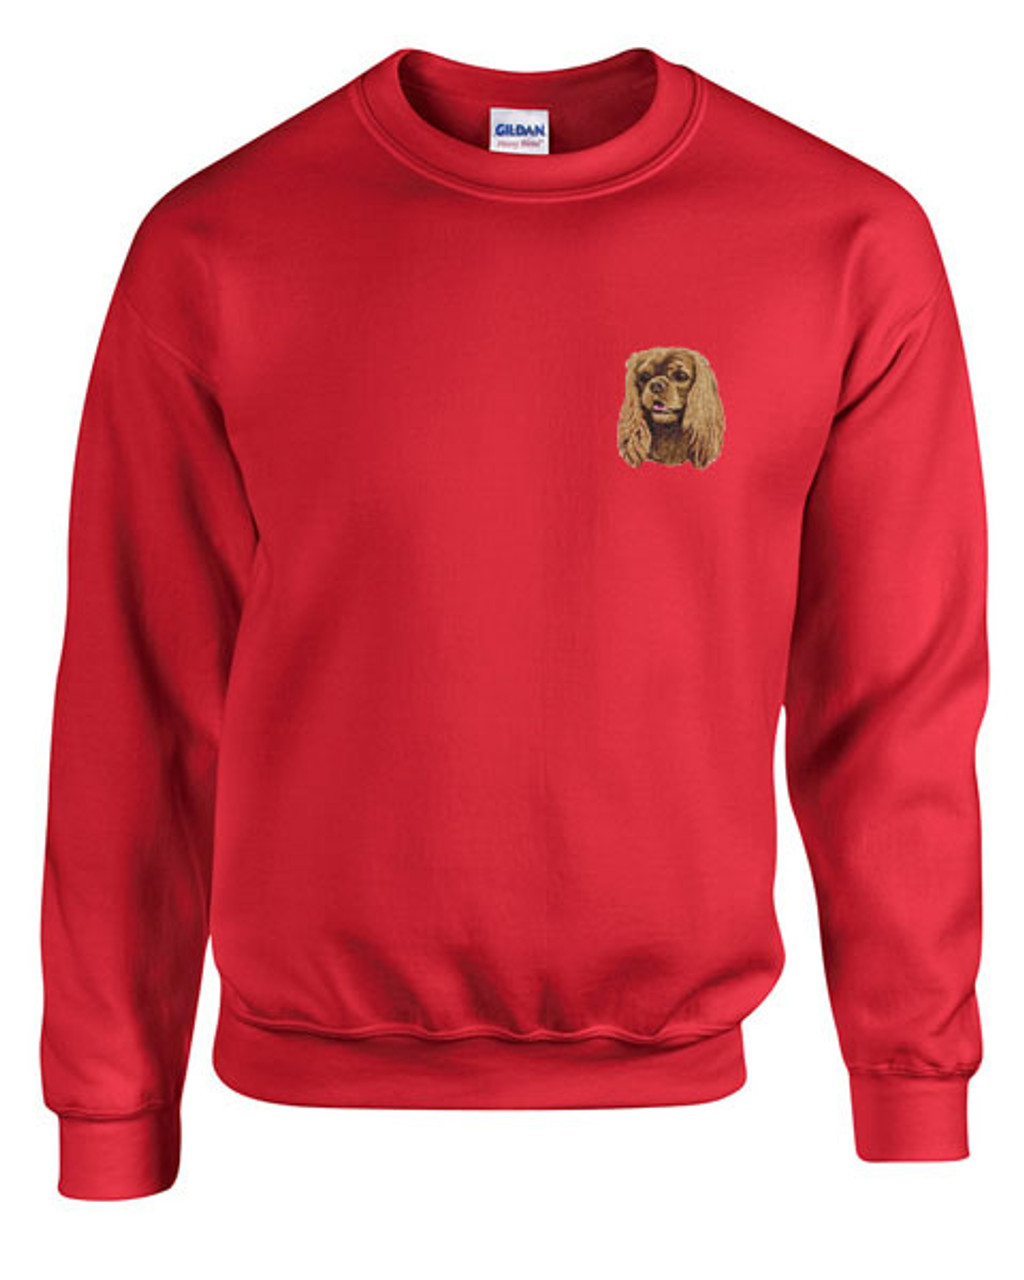 Cavalier King Charles Spaniel Custom Embroidered Sweatshirt Shirt